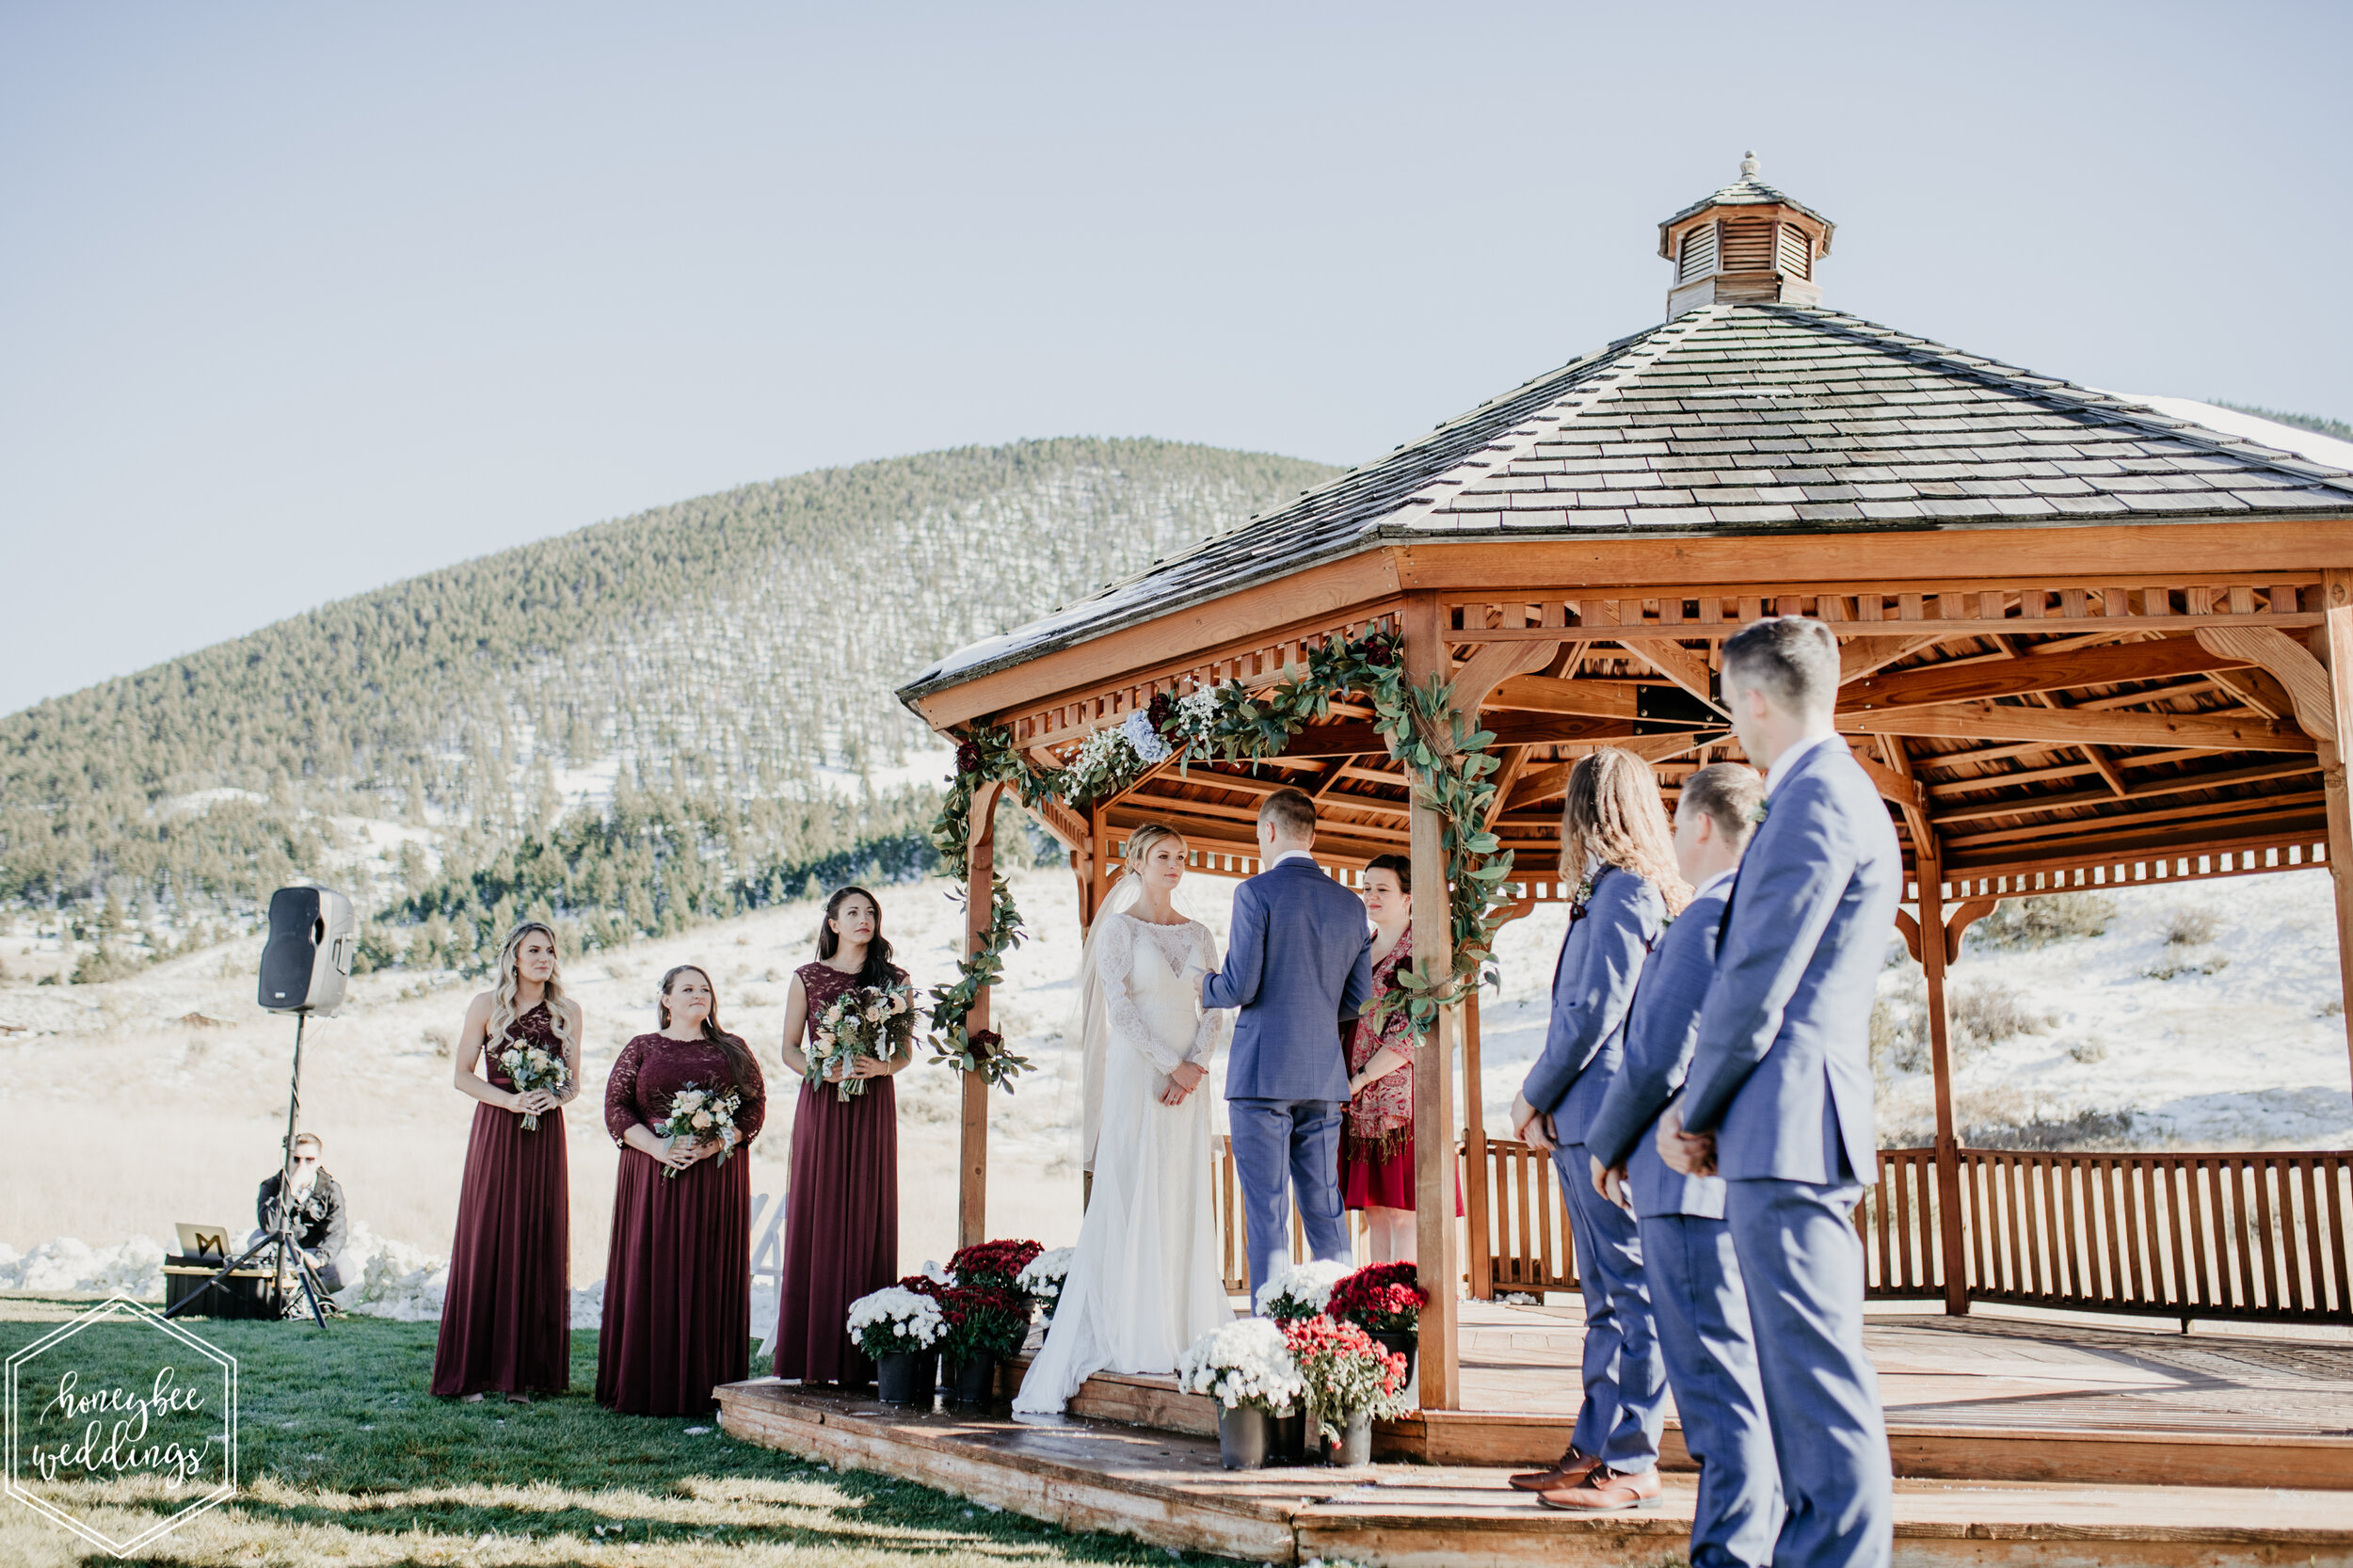 129Chico Hot Springs Wedding_Montana Wedding Photographer_Winter Wedding_Ariel & Richard_October 12, 2019-1565.jpg